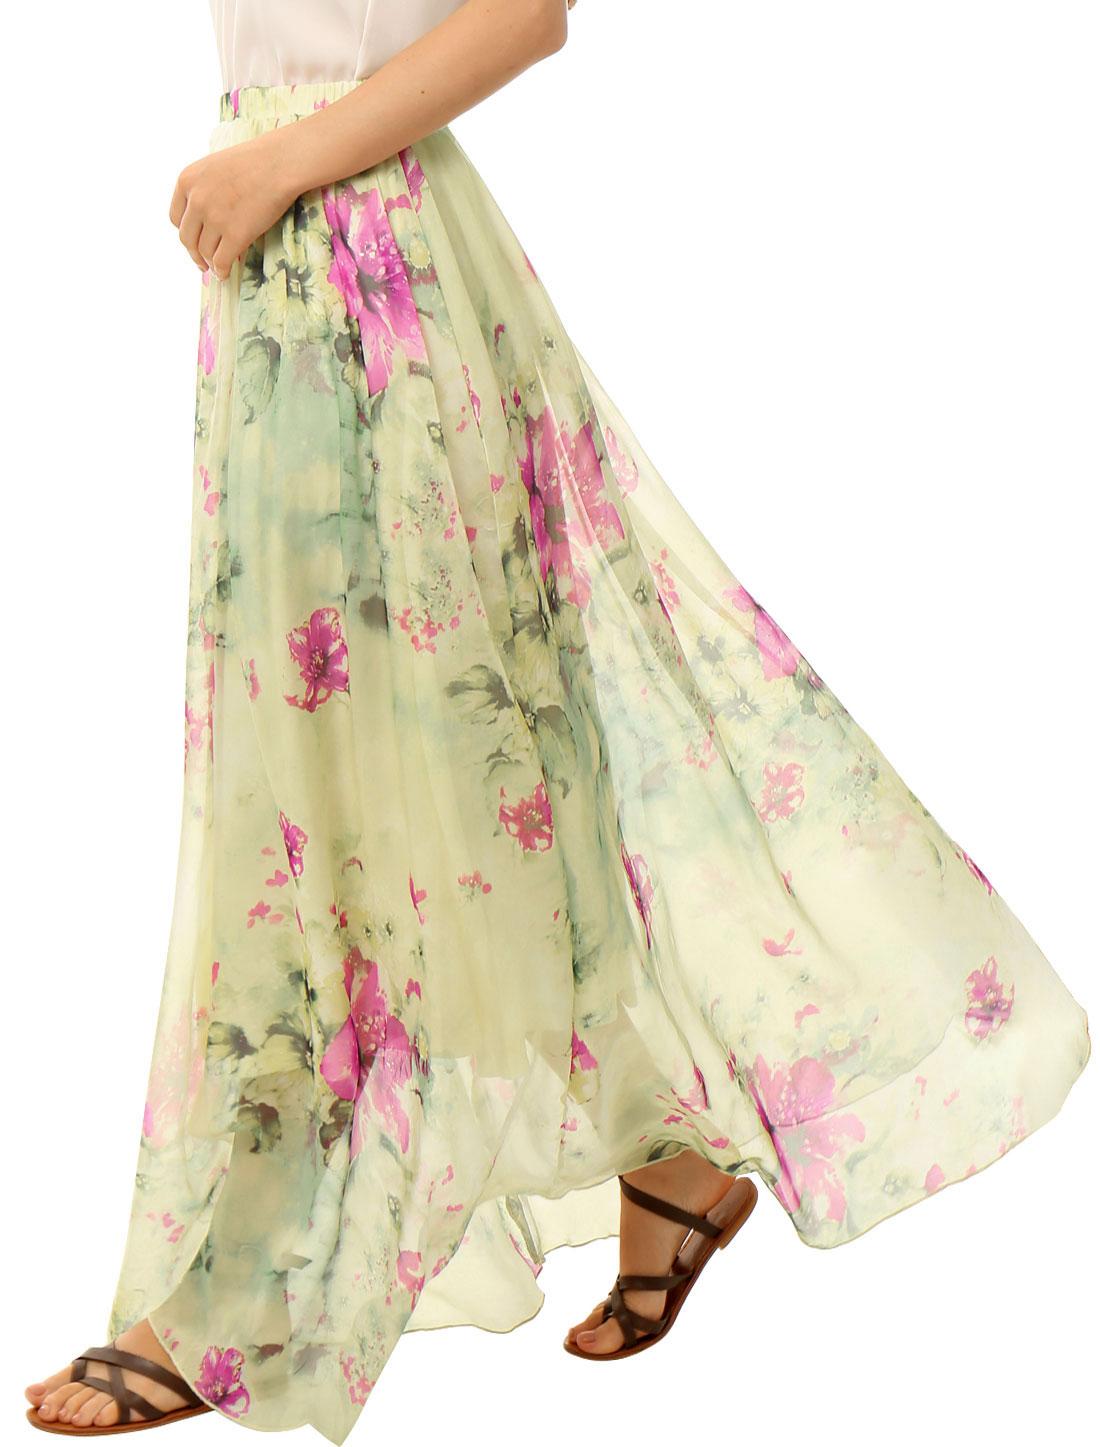 Women Elastic Waist Floral Prints Chiffon Flowy Maxi Skirt Beige S